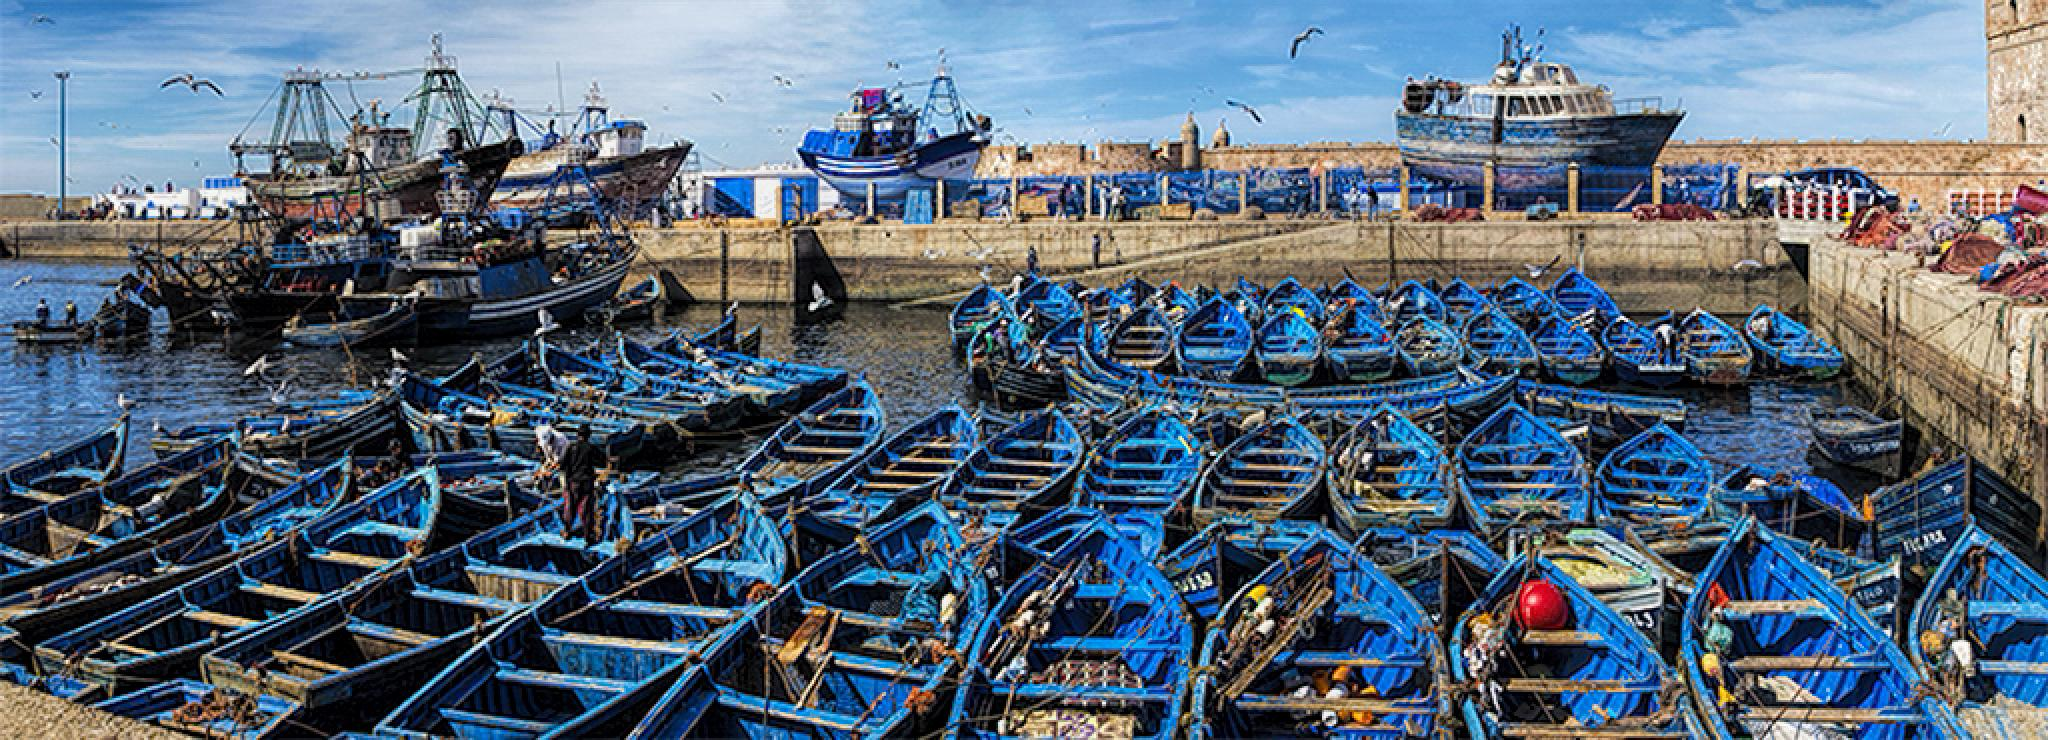 Essaouira habour, Morocco by lungaro1